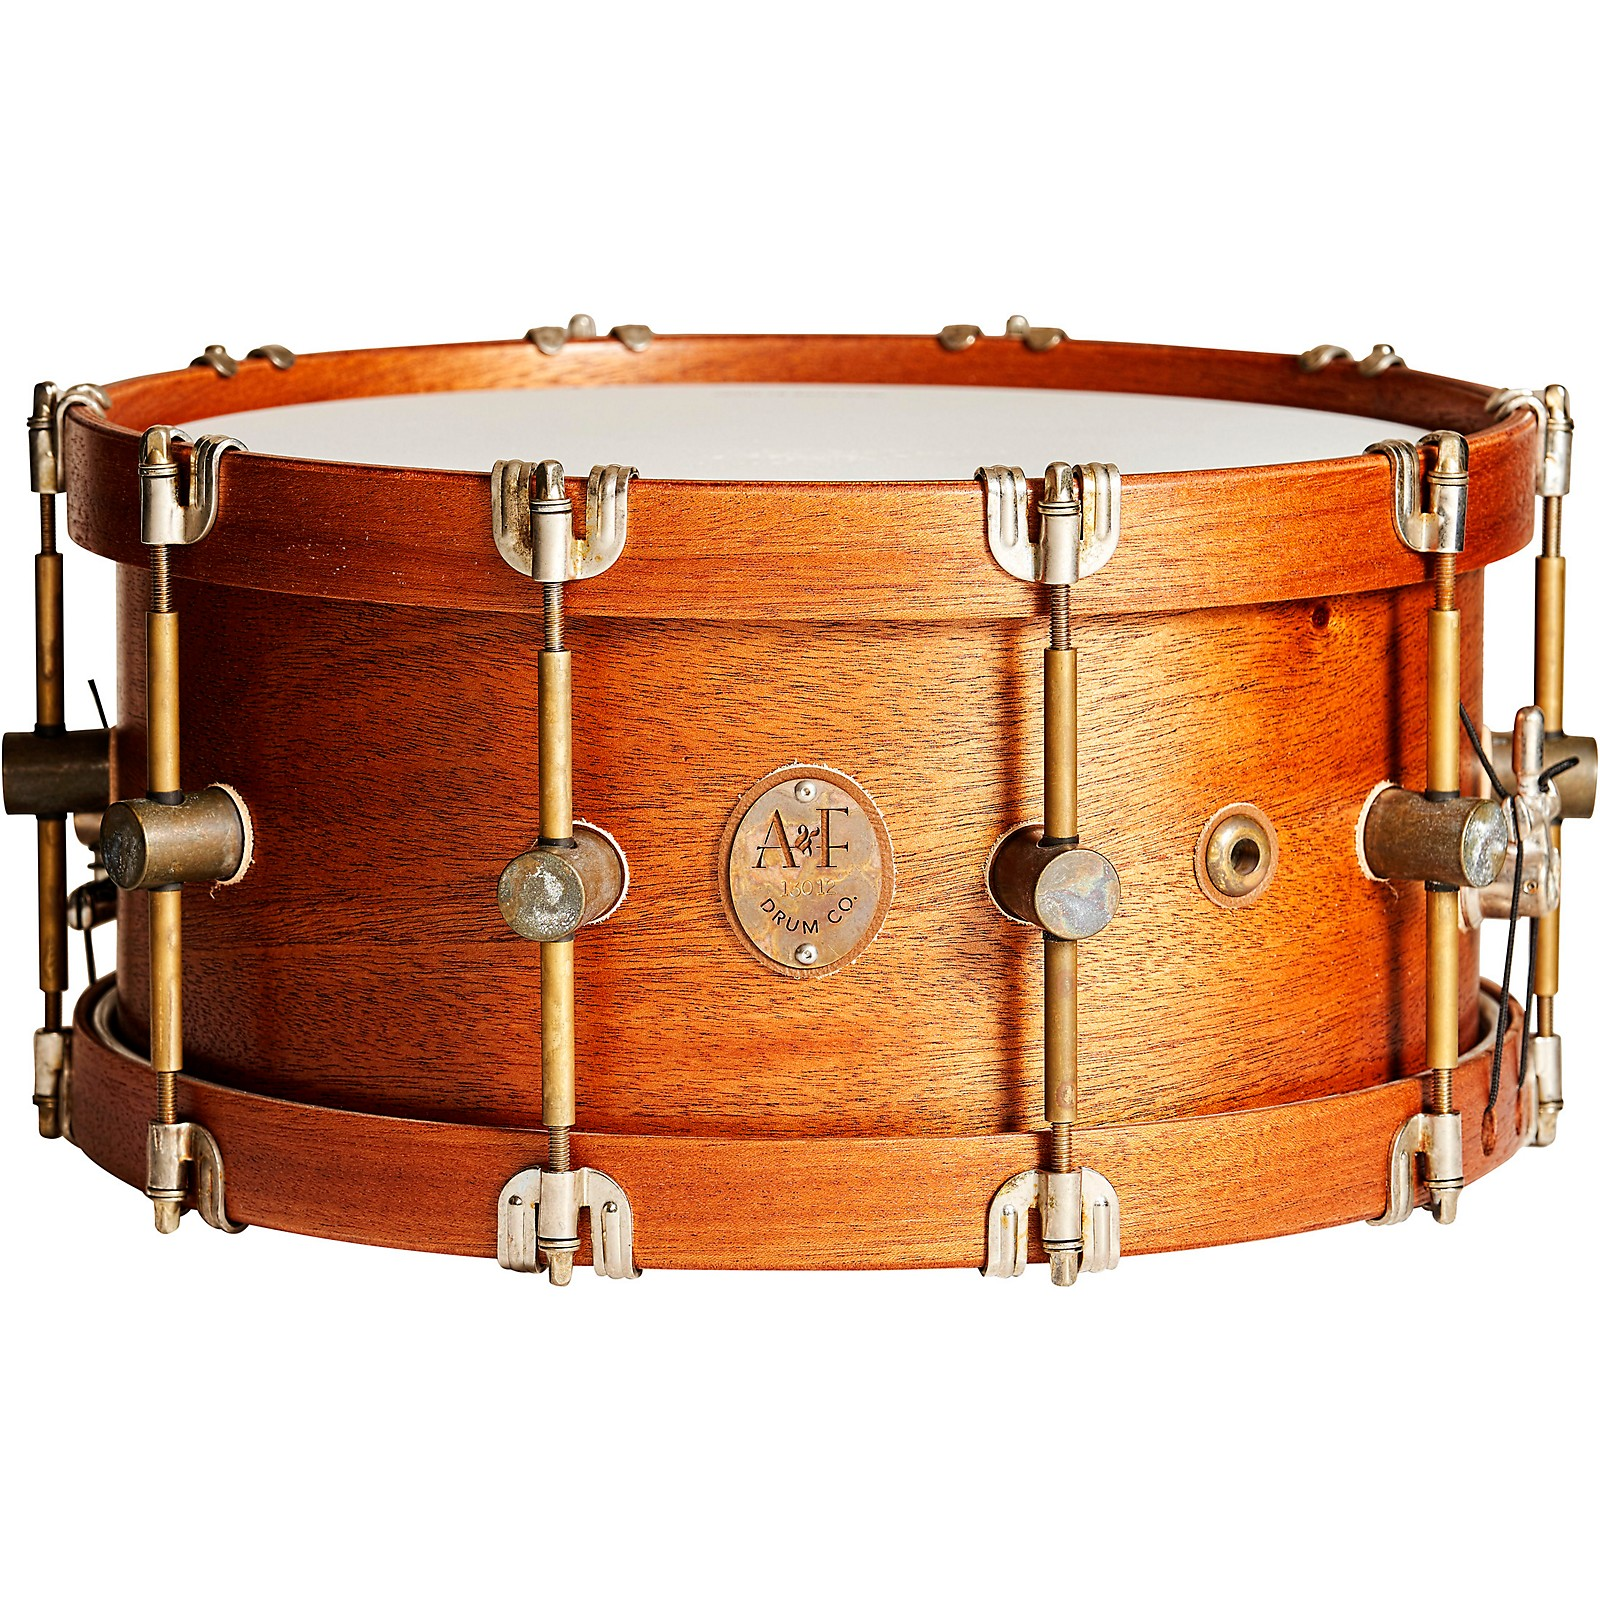 A&F Drum Co Mahogany Club Snare